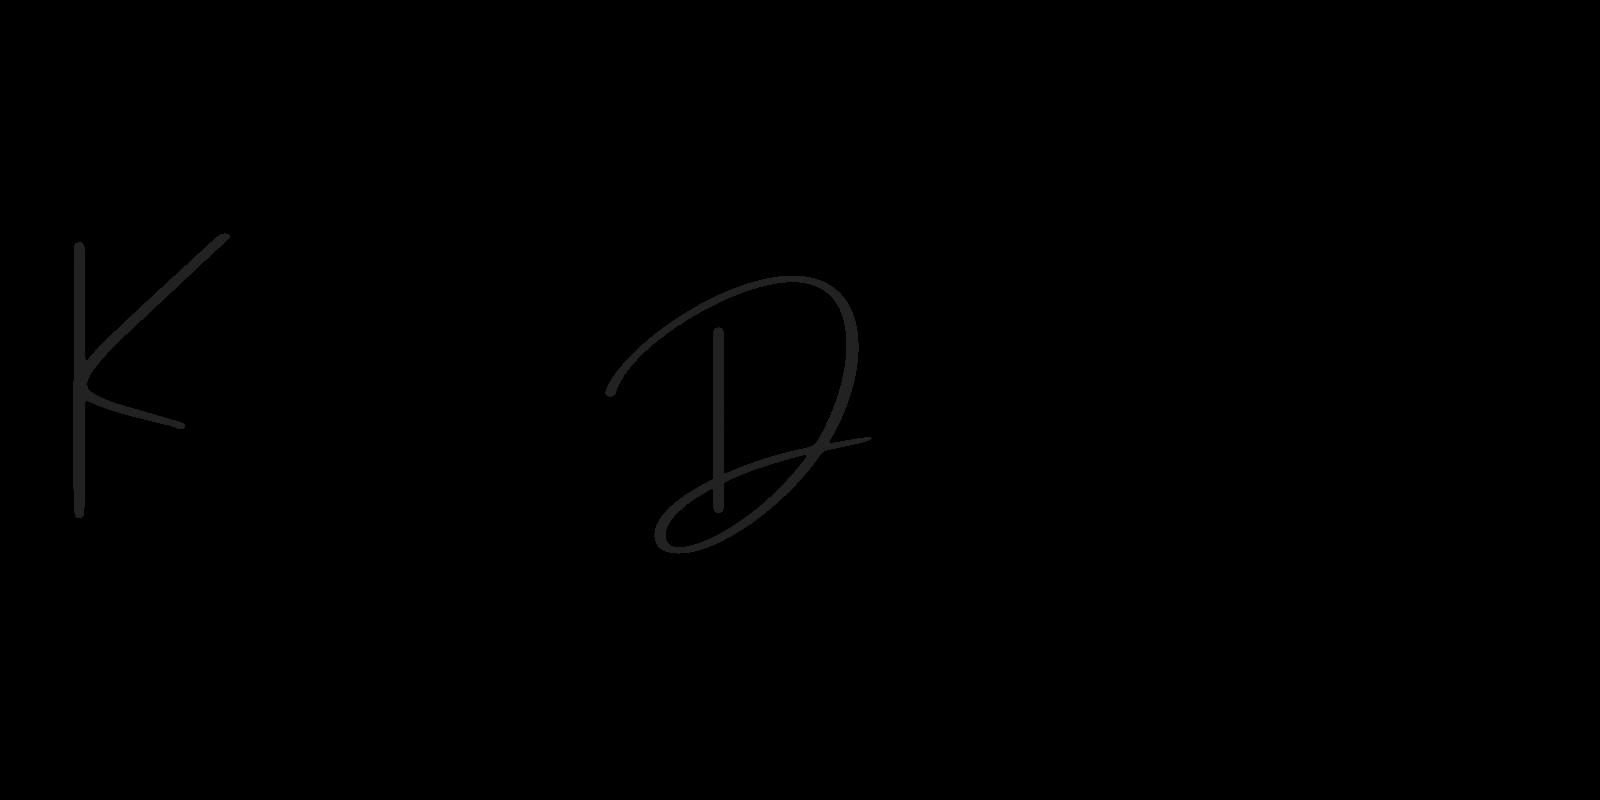 Kacy Drouin